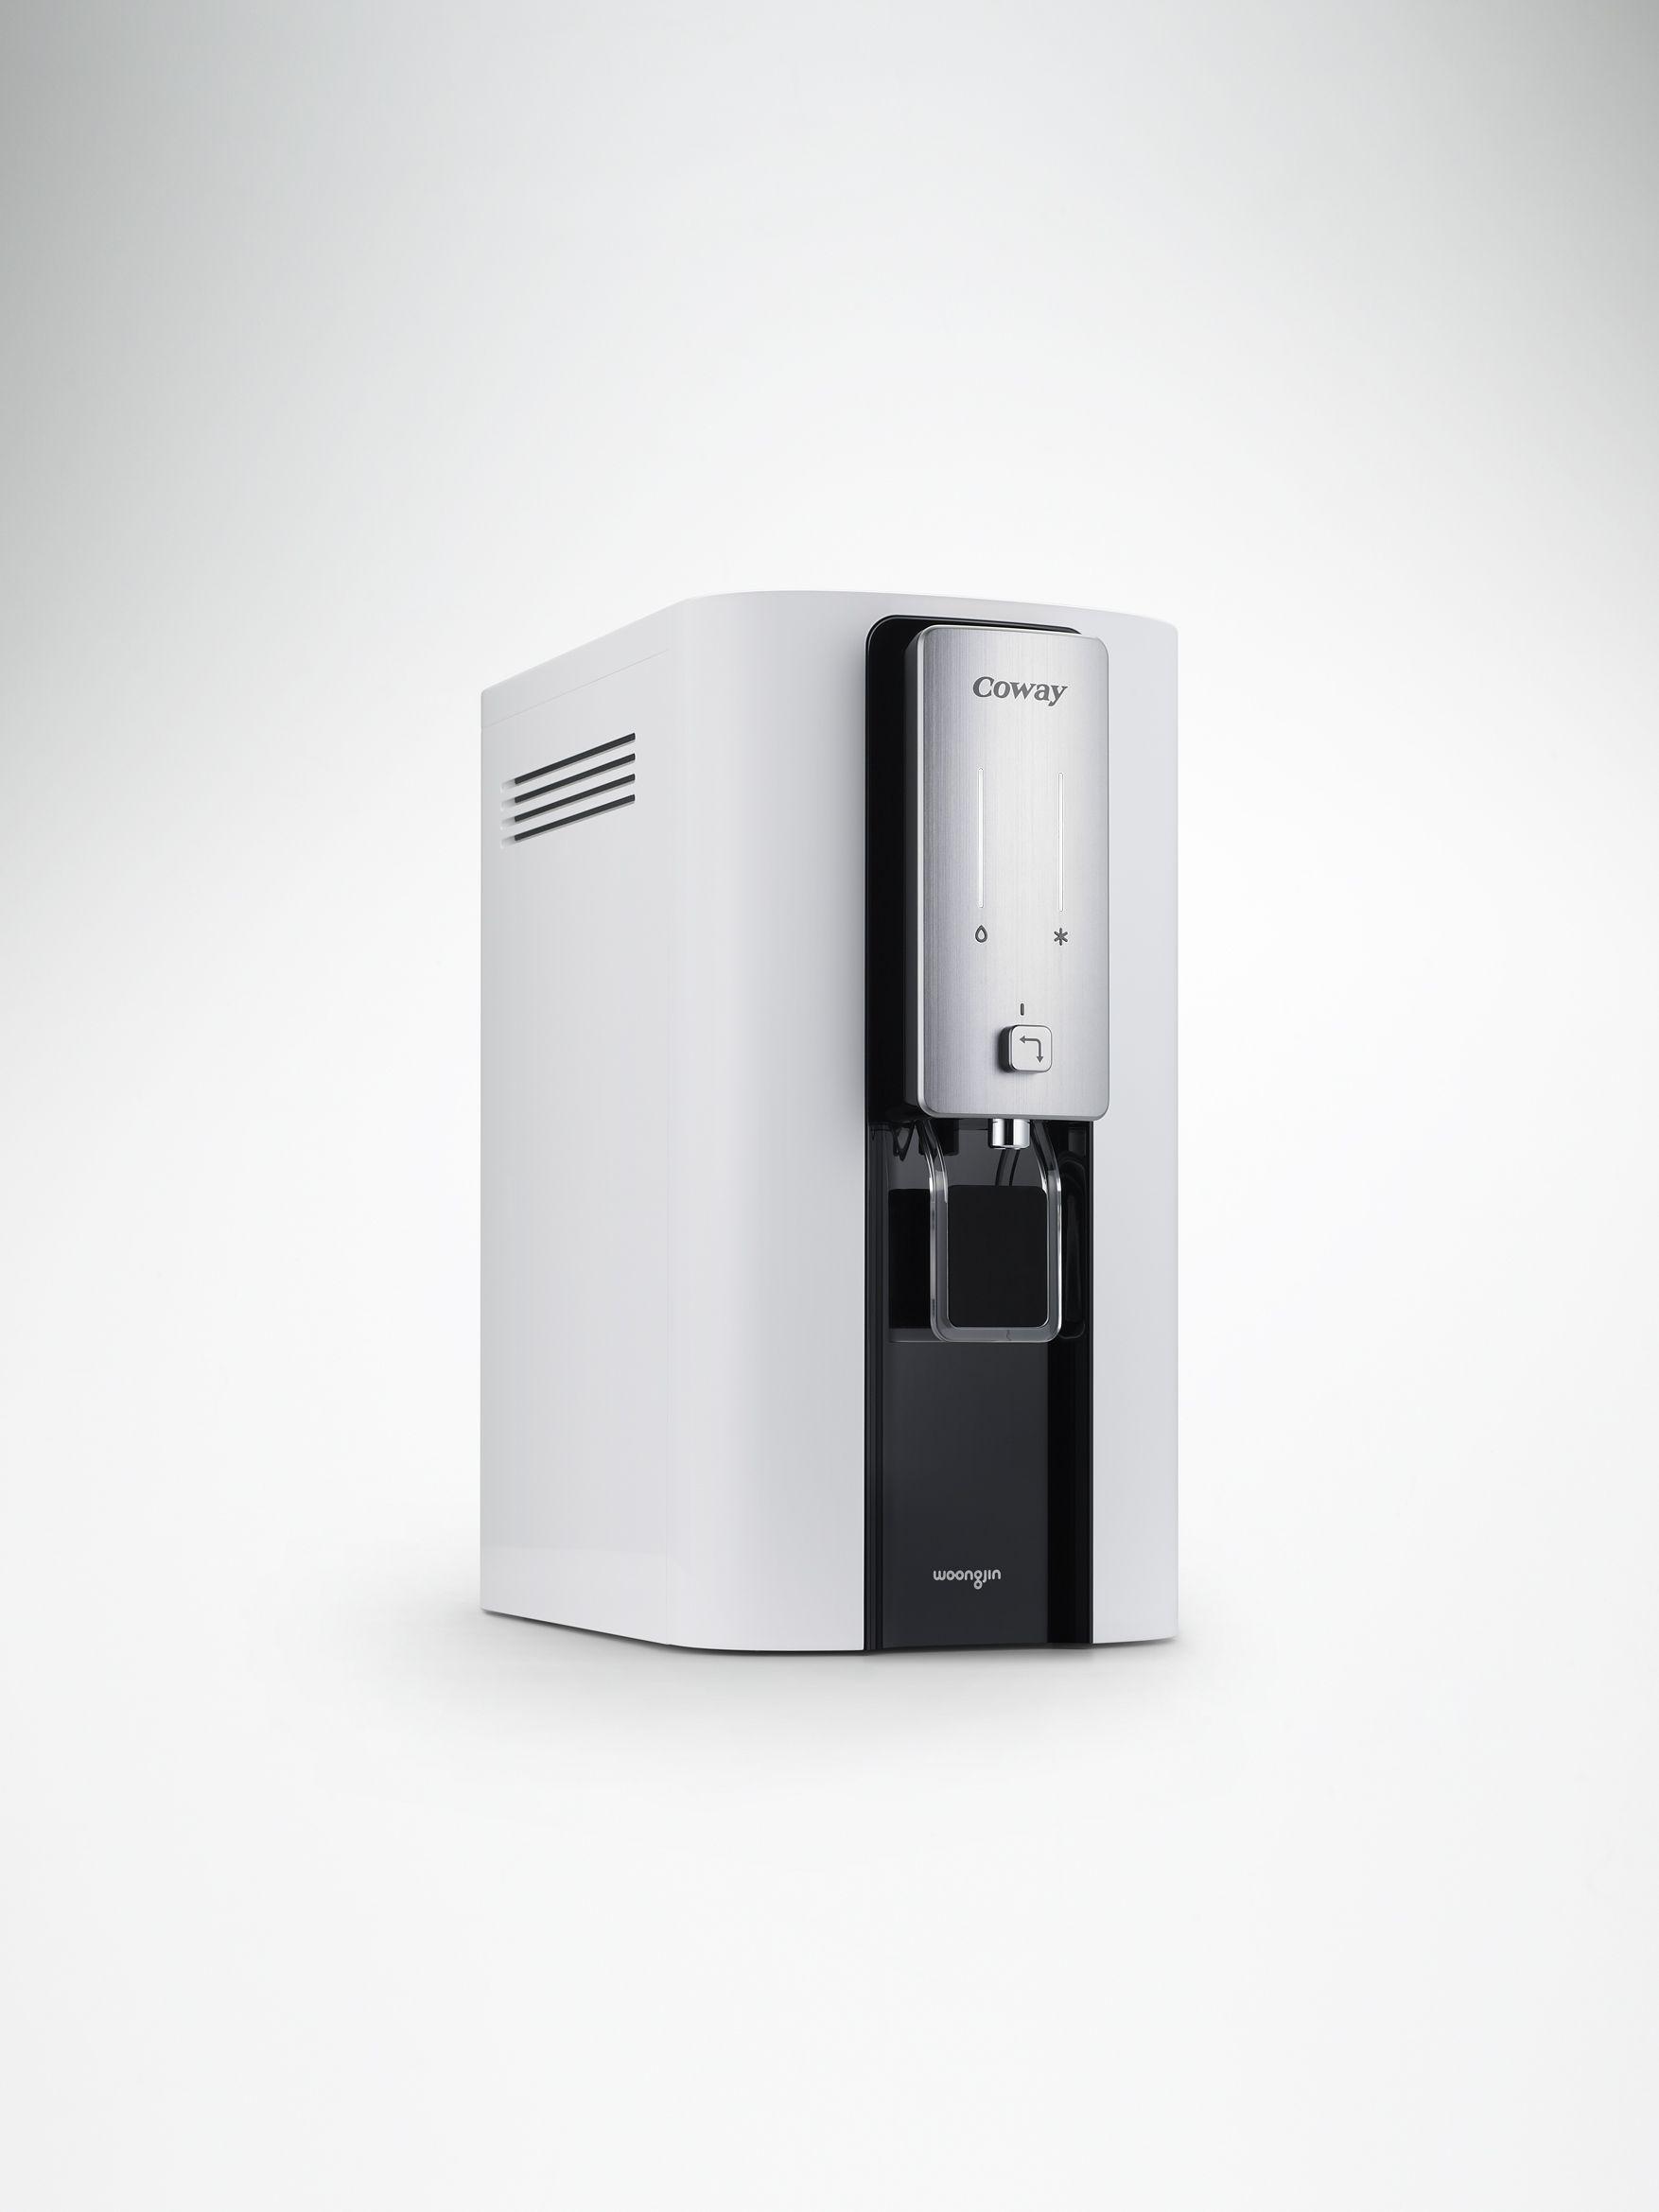 Design Water Purifier Coway Design Water Dispenser